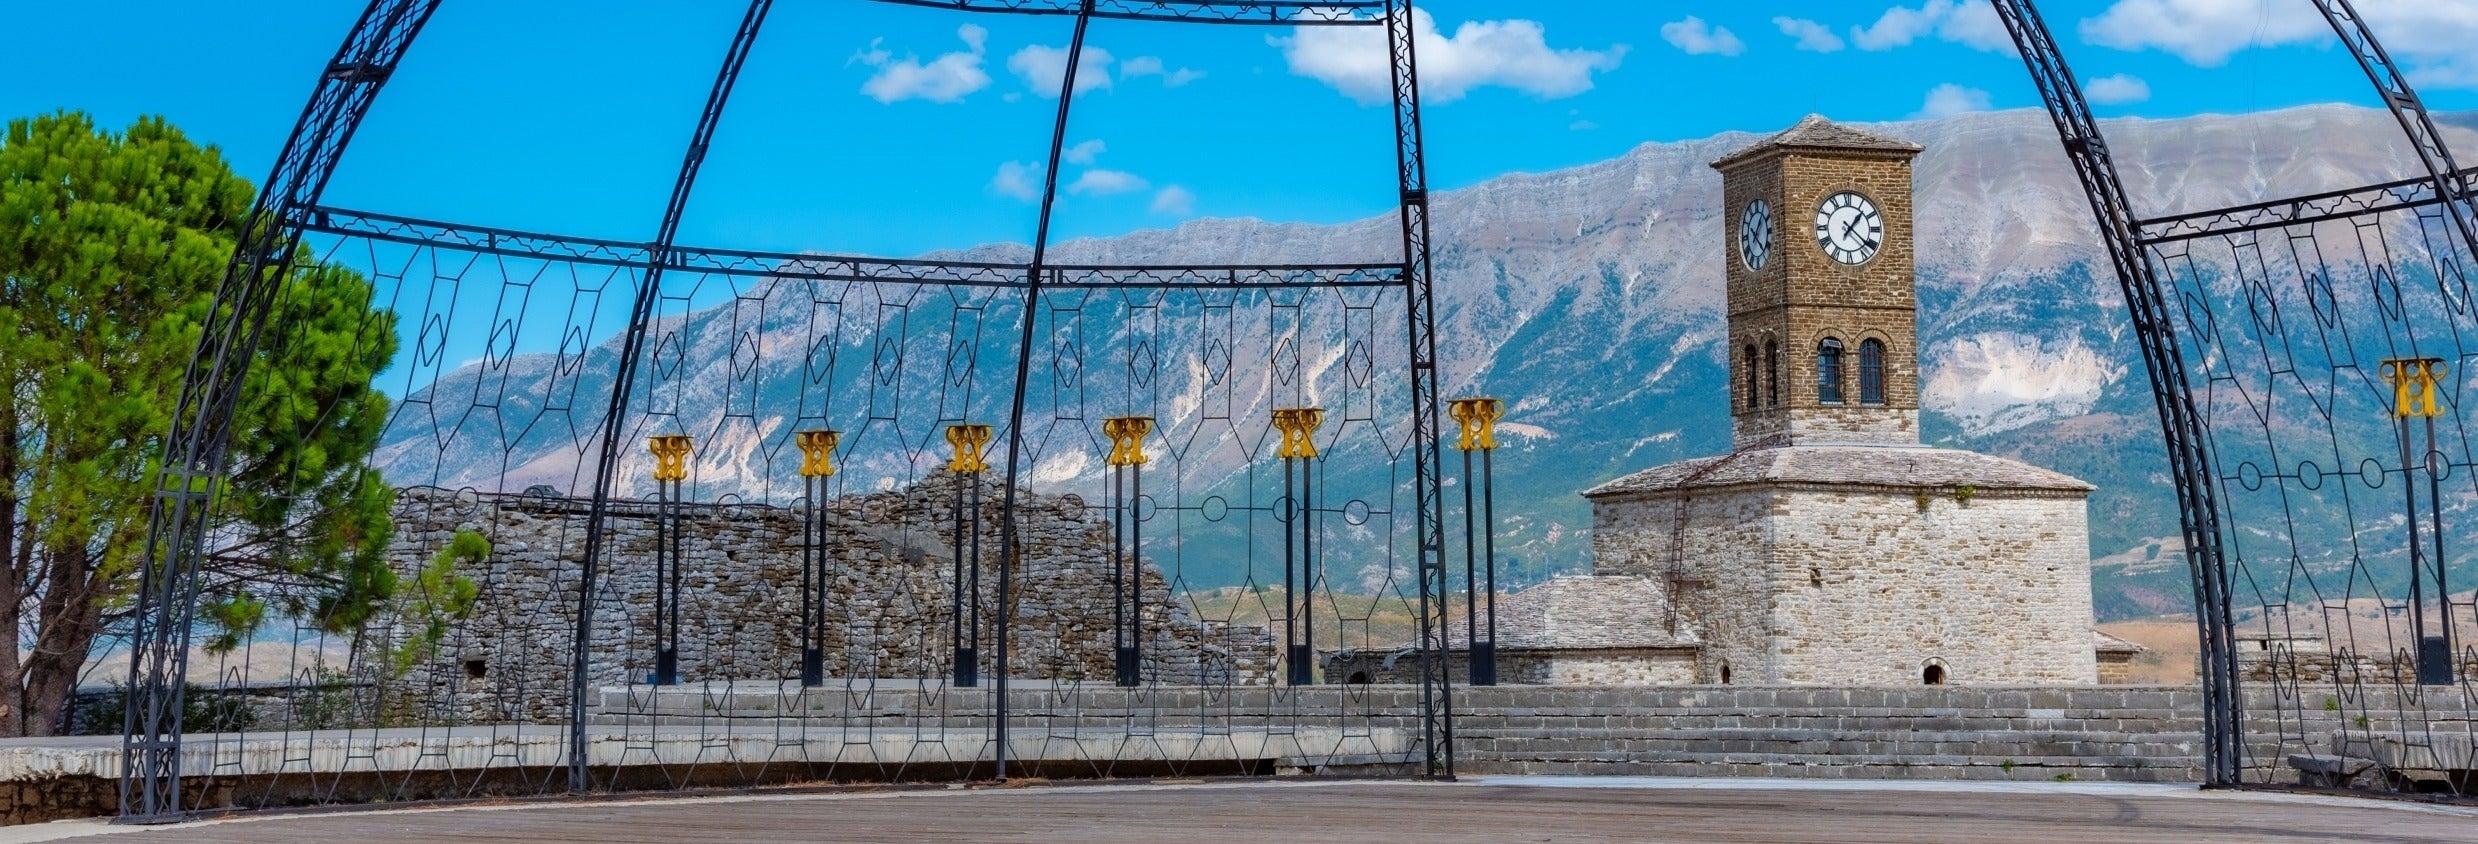 Excursão a Gjirokastra e Castelo Lëkurësi